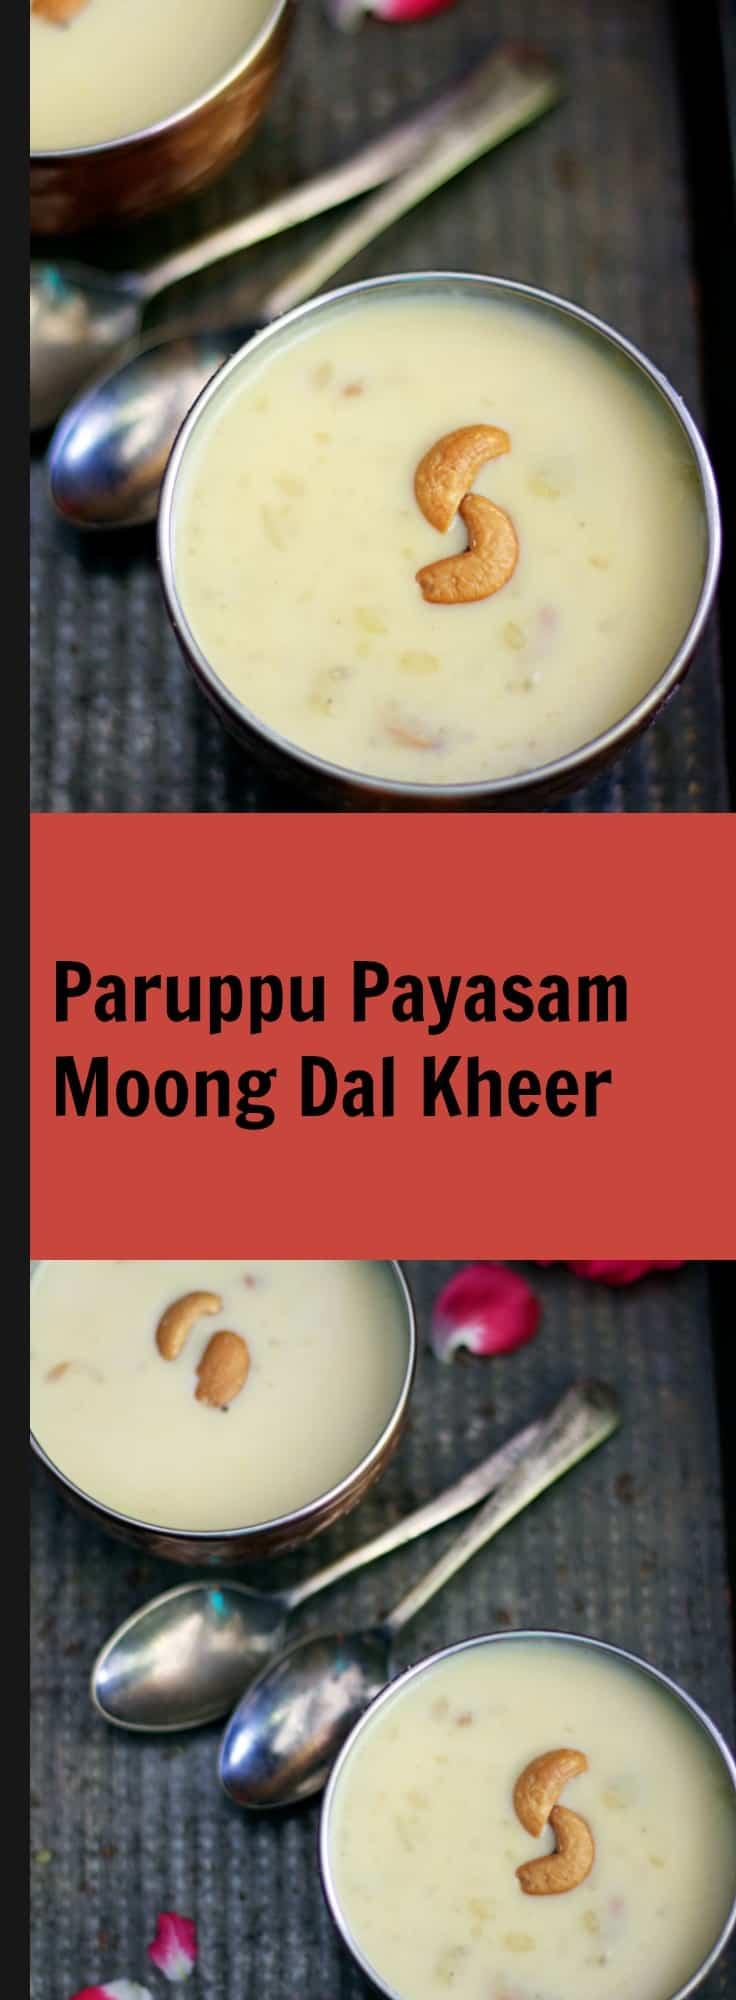 paruppu-payasam-moong-dal-kheer